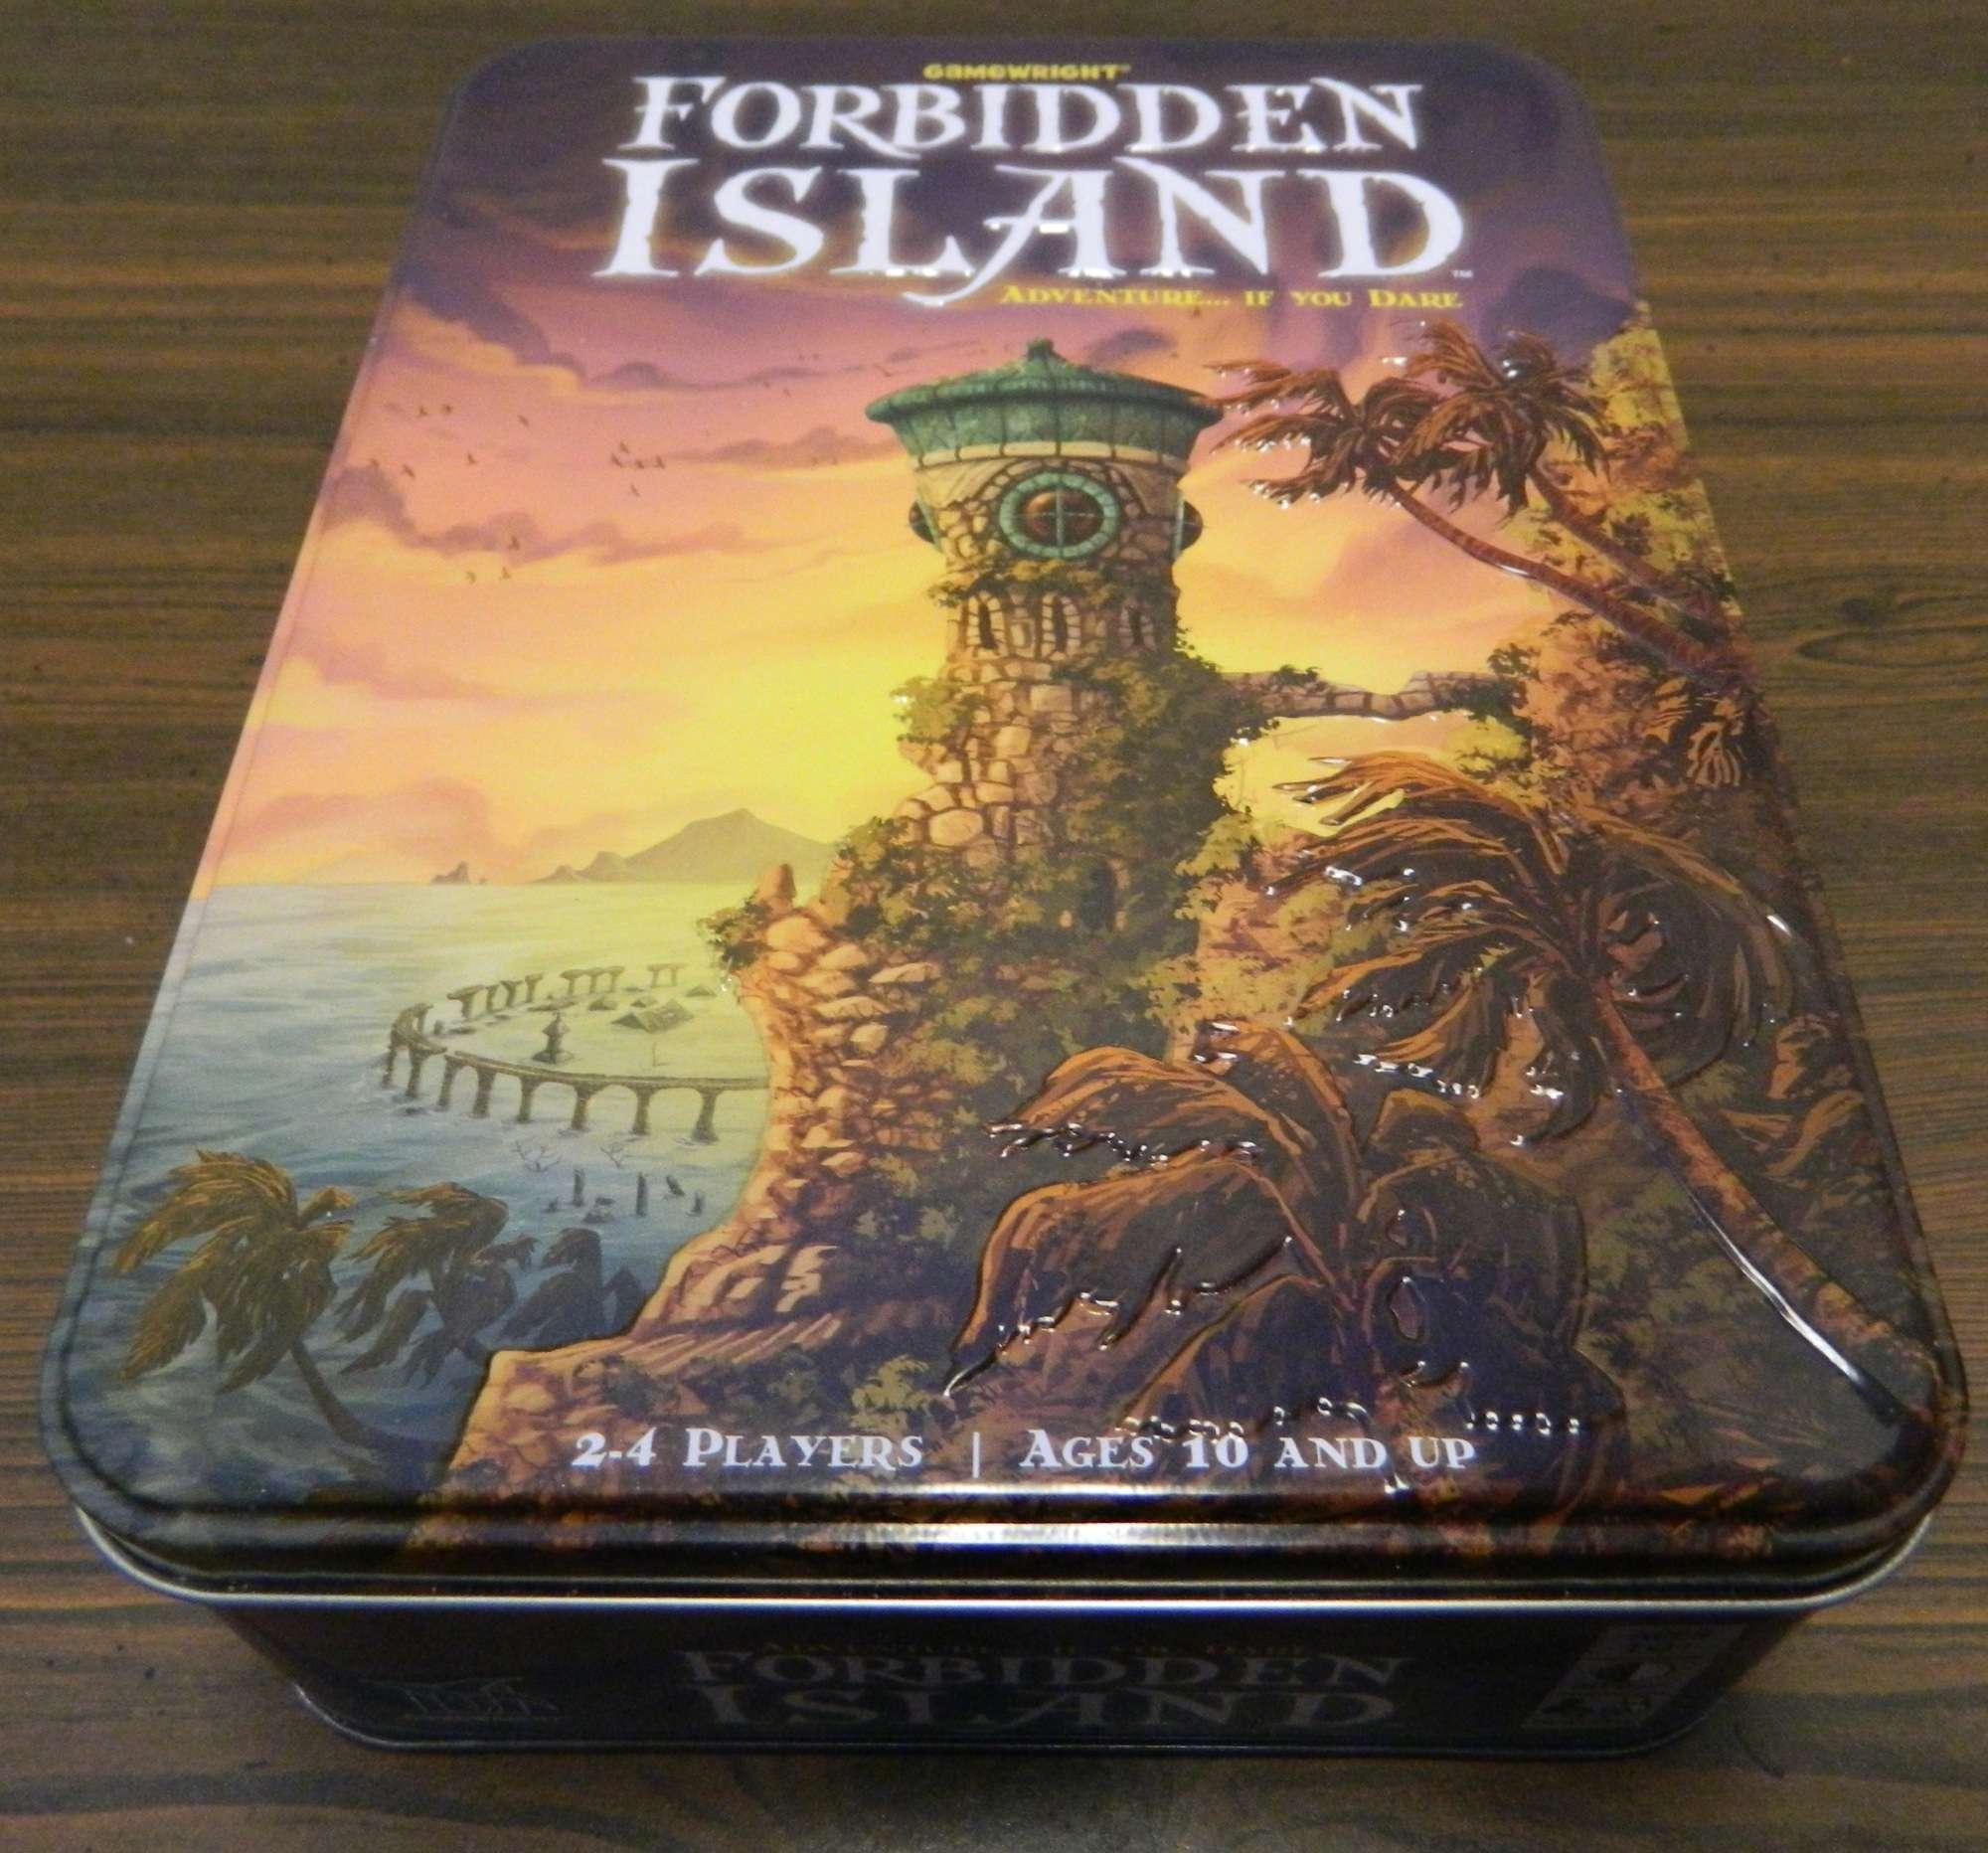 Box for Forbidden Island